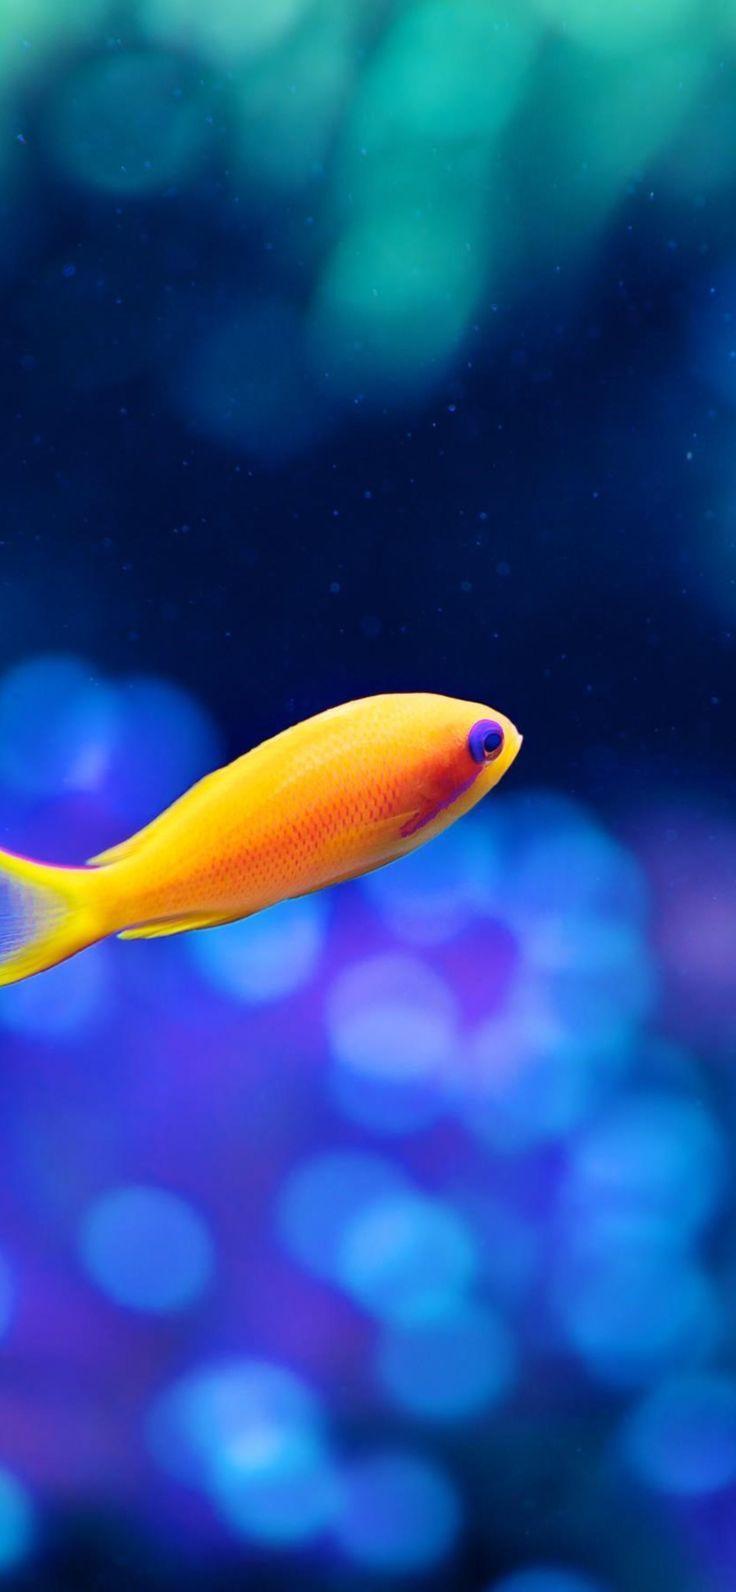 Download Iphone Xs Max Wallpaper Fish Animalbackgroundiphone Download Fish Iphone Max Fish Wallpaper Live Fish Wallpaper Animal Wallpaper